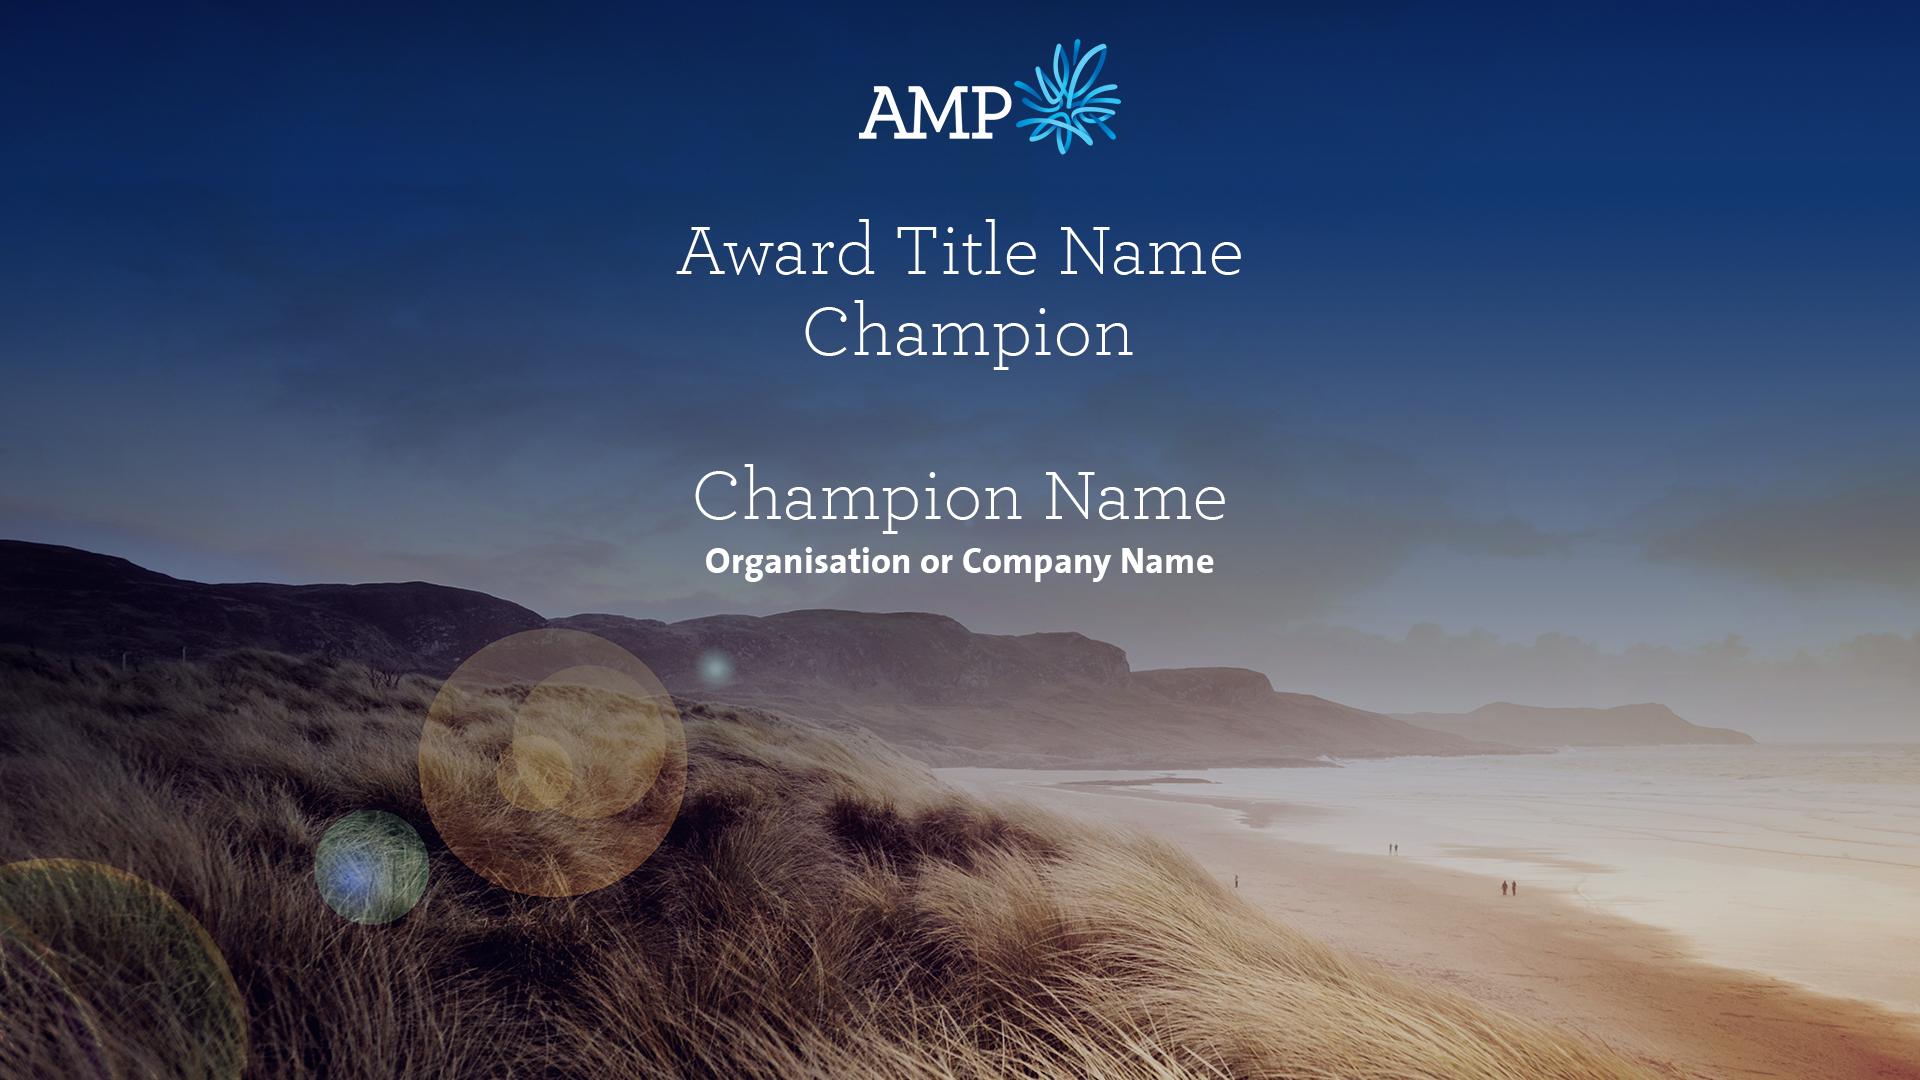 AMP_Awards 2015_Champion Layout.jpg